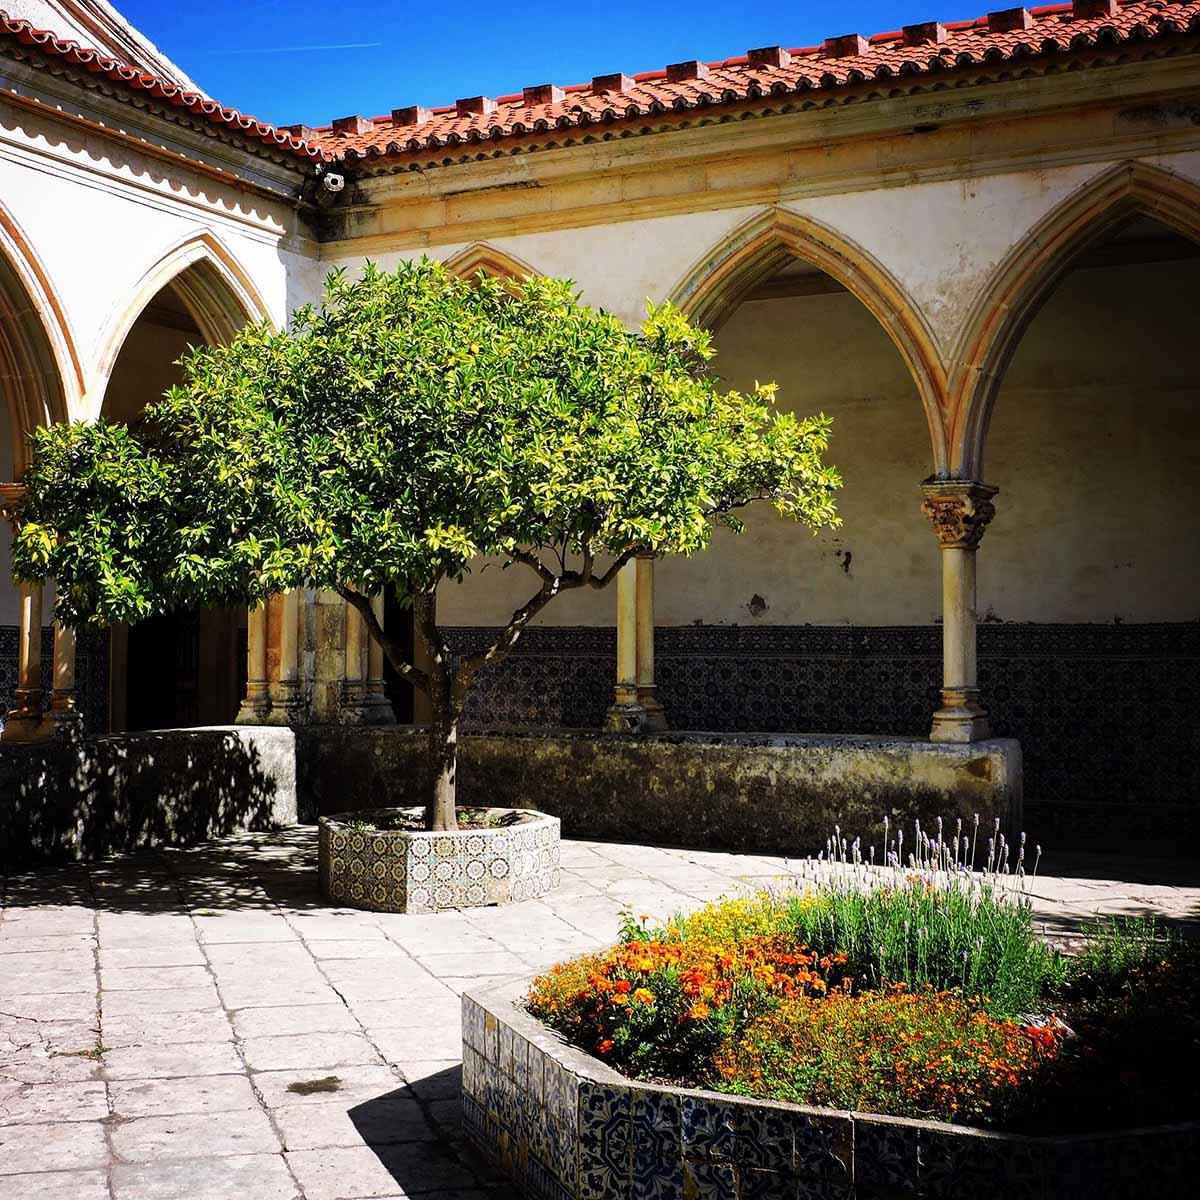 Jeronimos Monastery in Belem, Lisbon